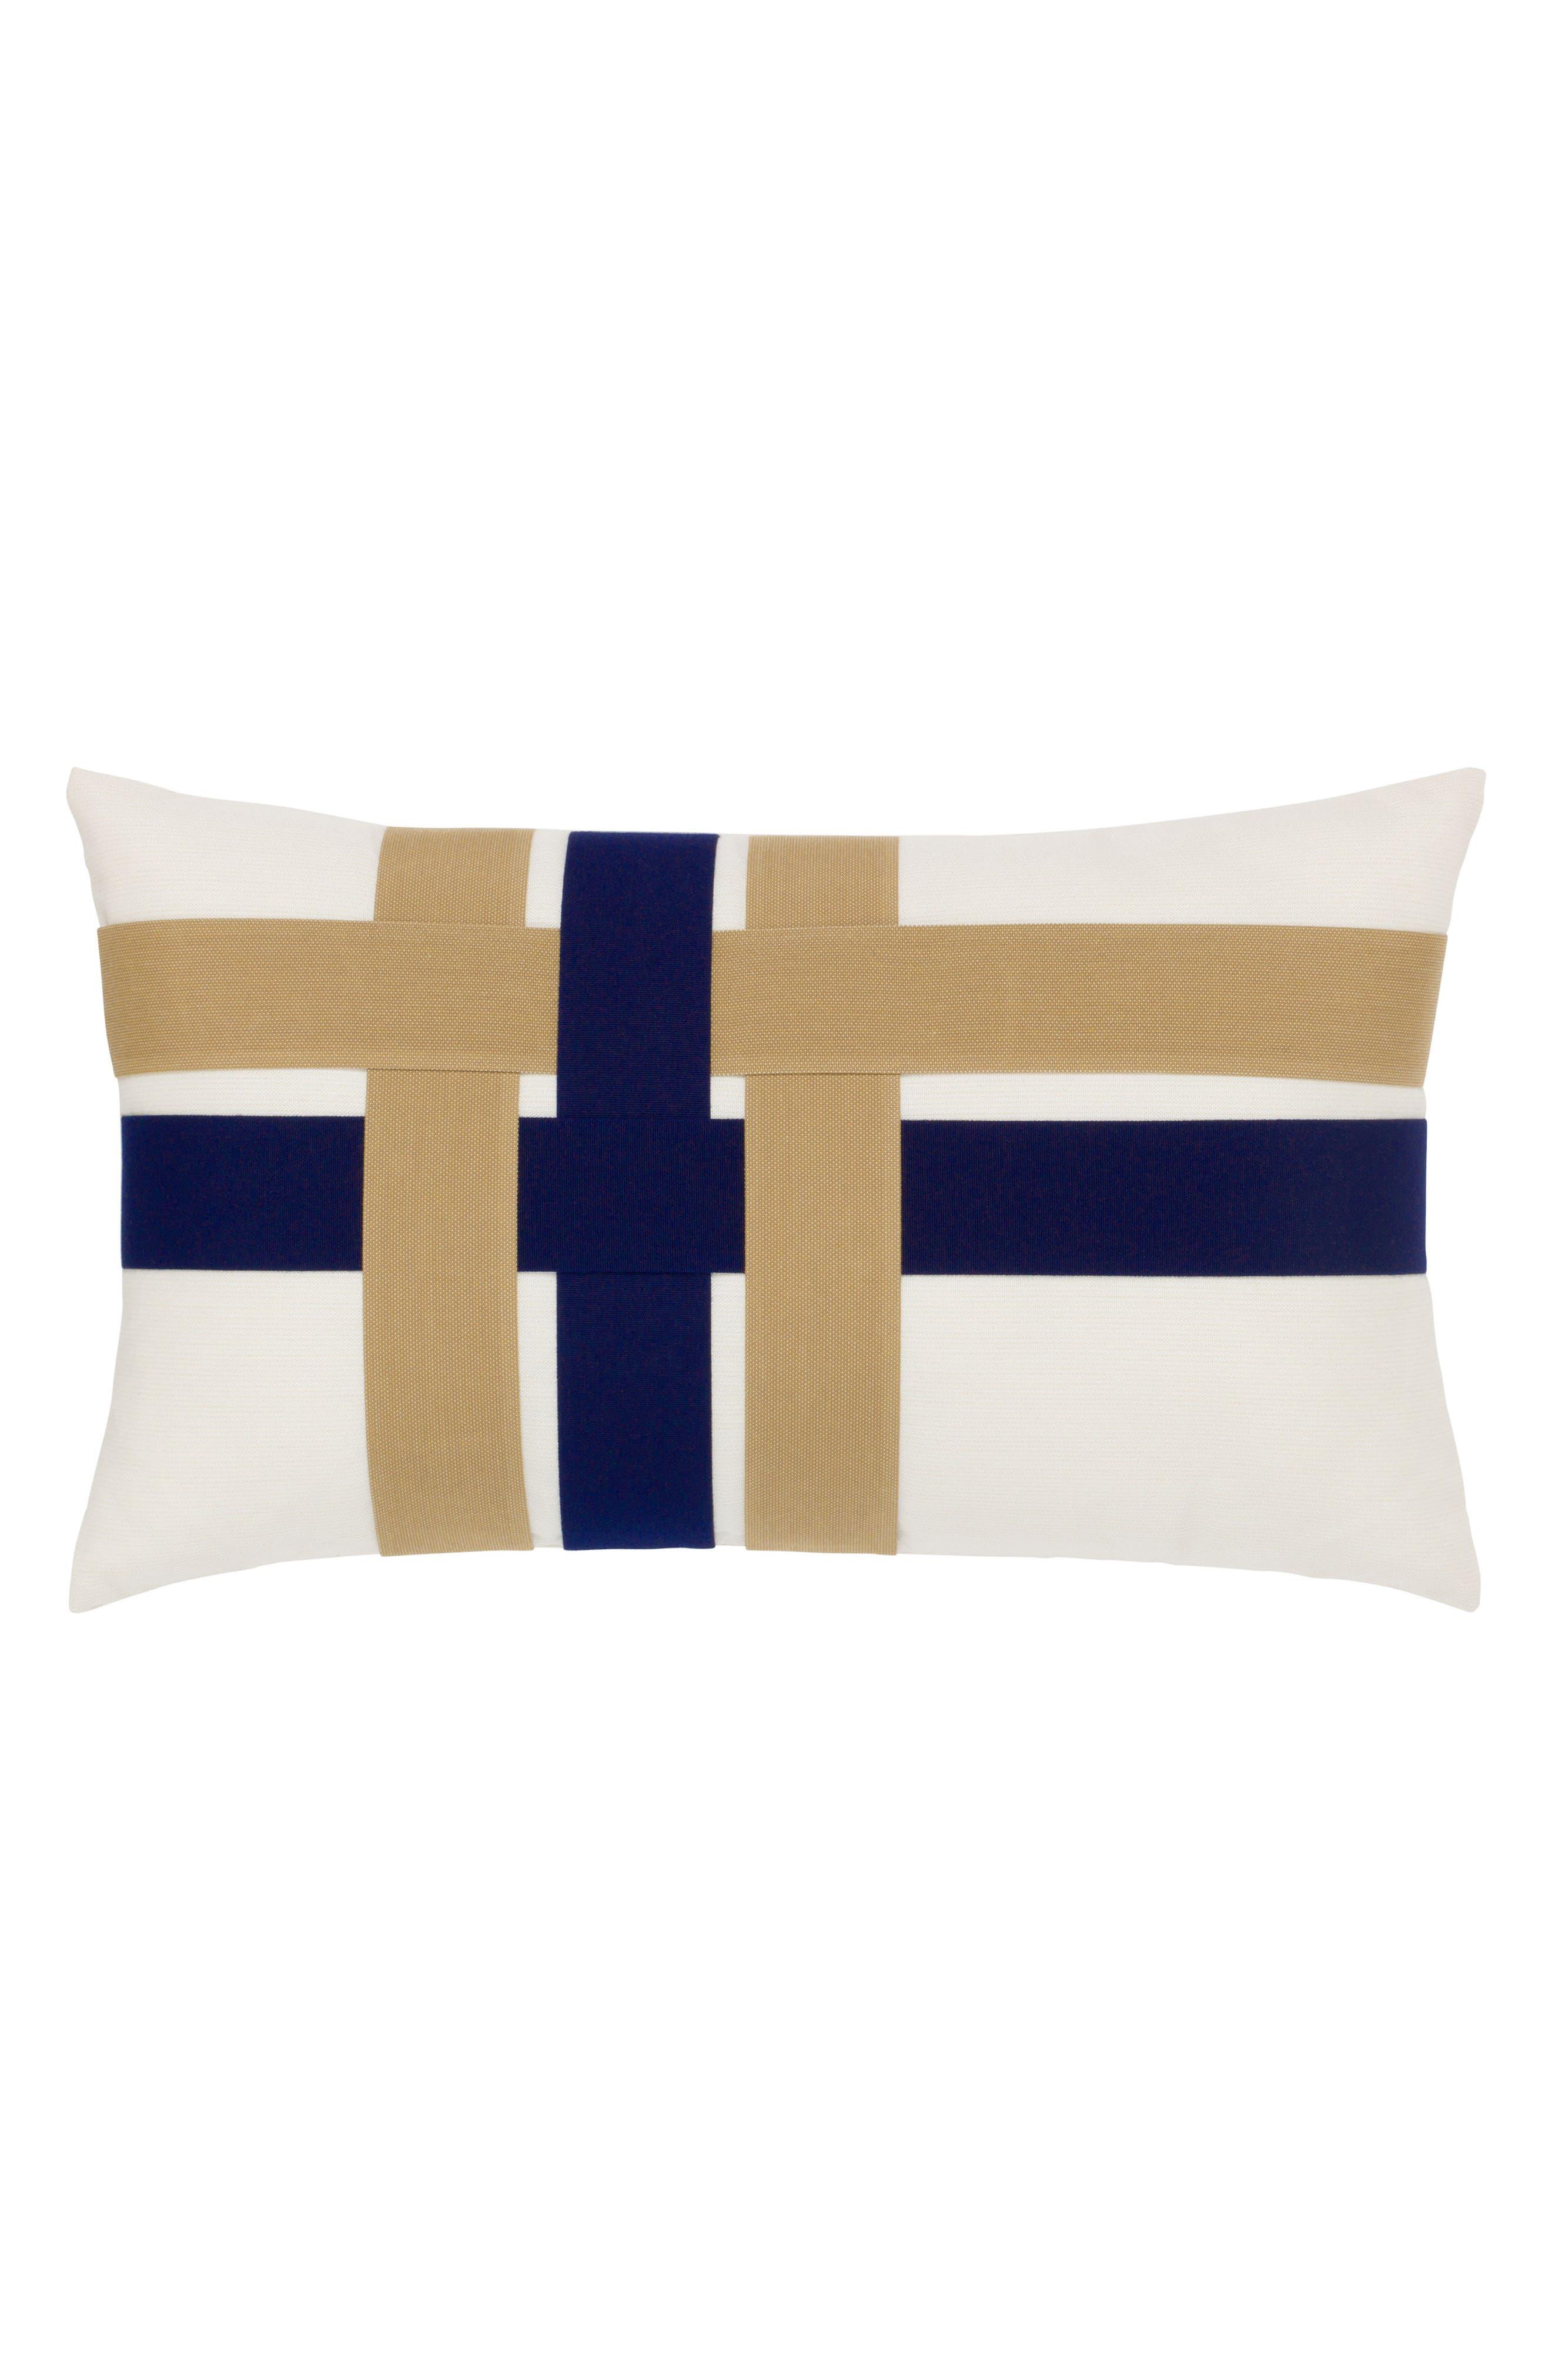 Woven Shimmer Lumbar Pillow,                             Main thumbnail 1, color,                             BLUE/ WHITE